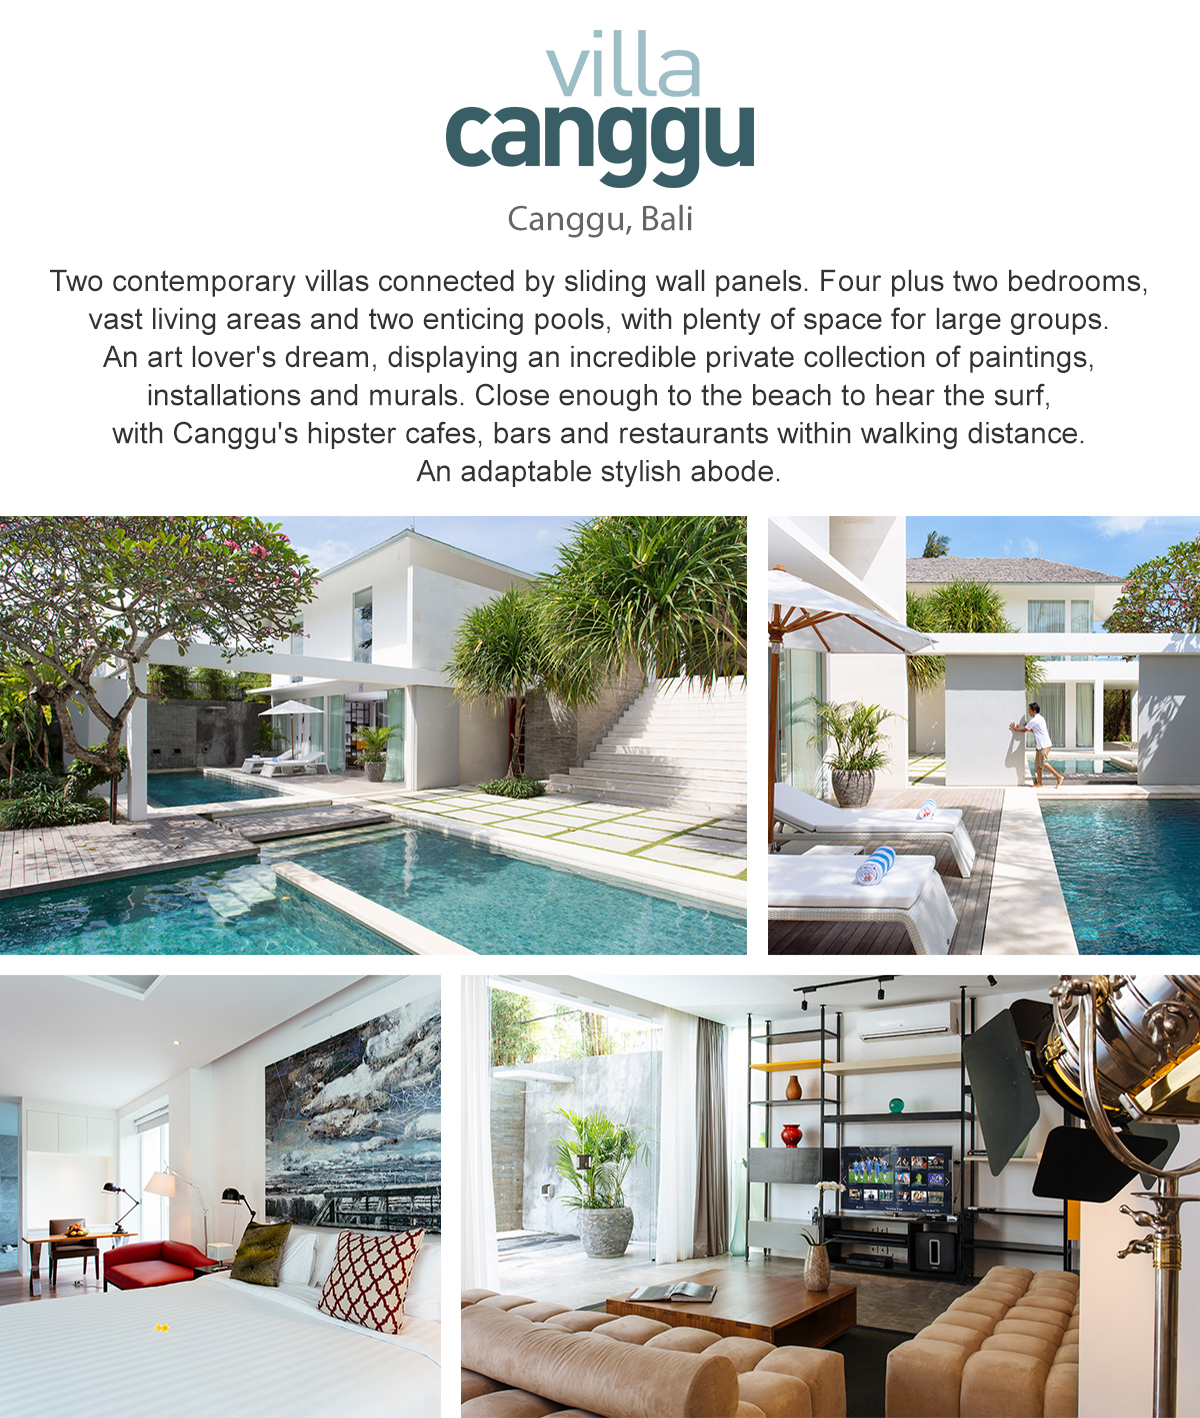 Villa Canggu - Canggu, Bali